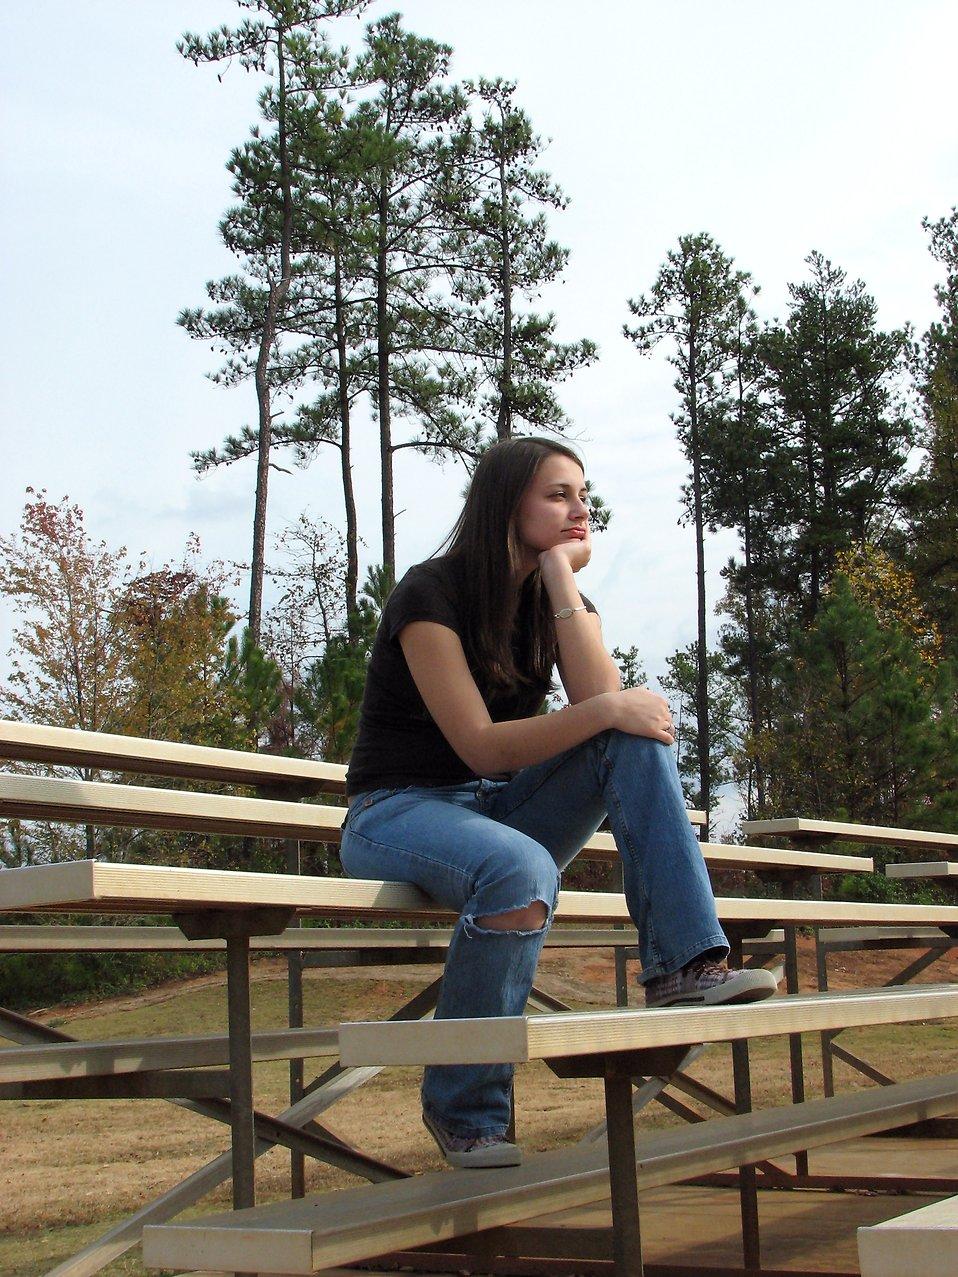 A teenage girl sitting on bleachers : Free Stock Photo